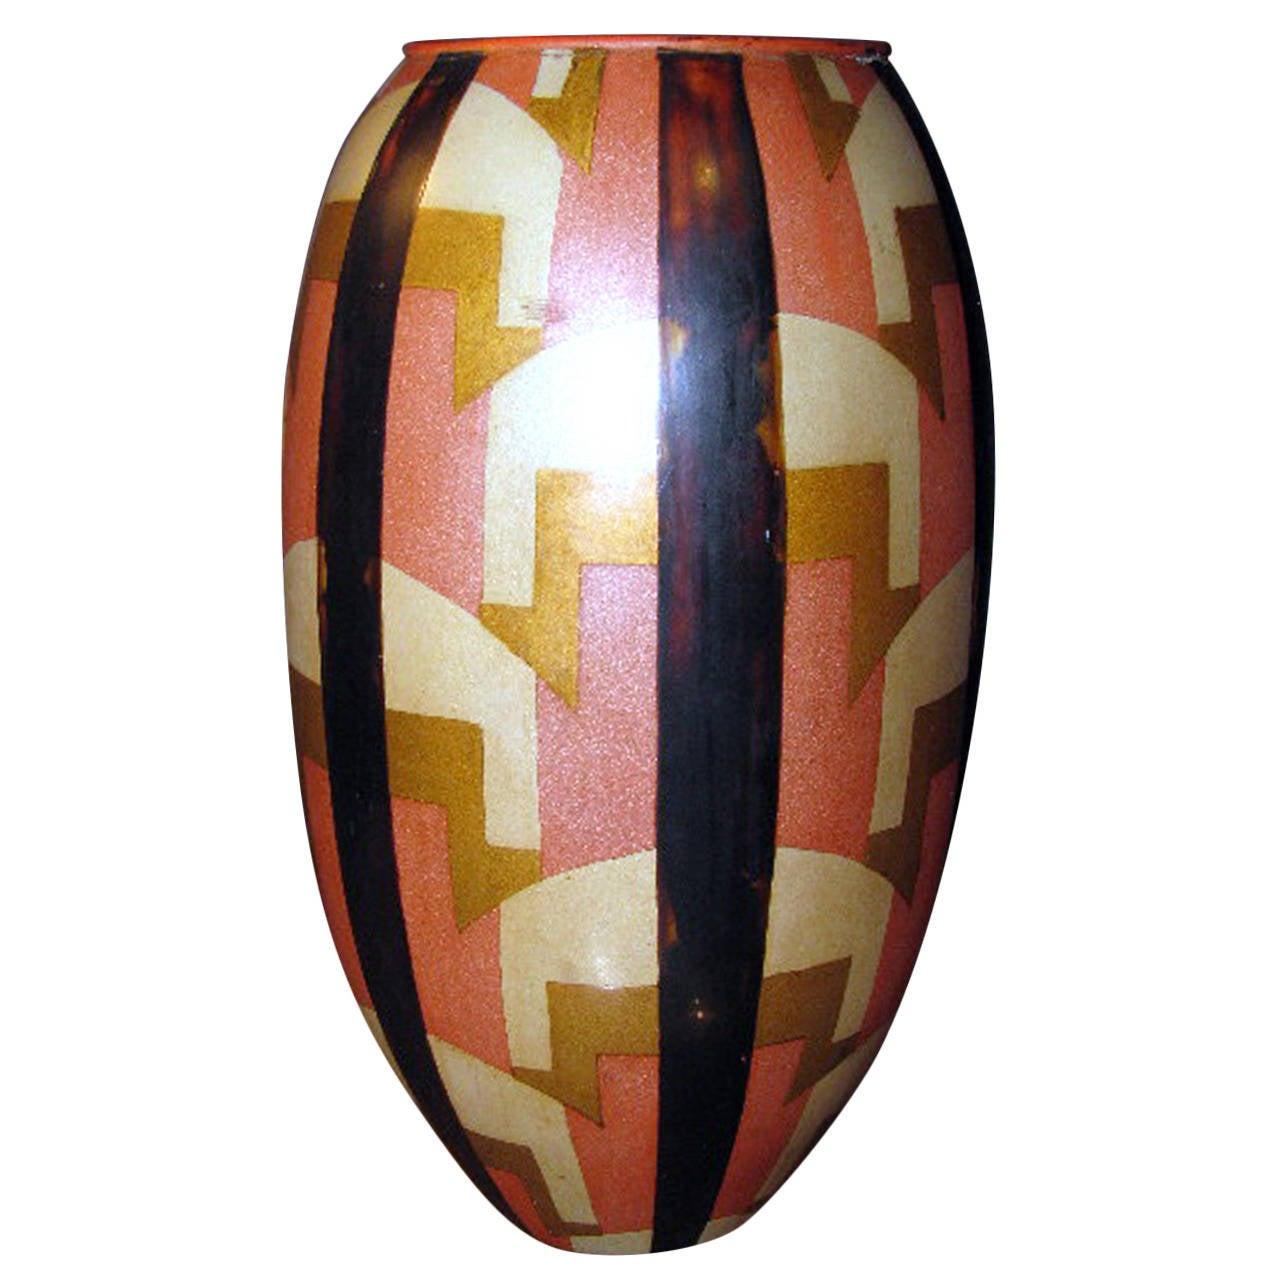 Egg-Shaped Lacquer Vase